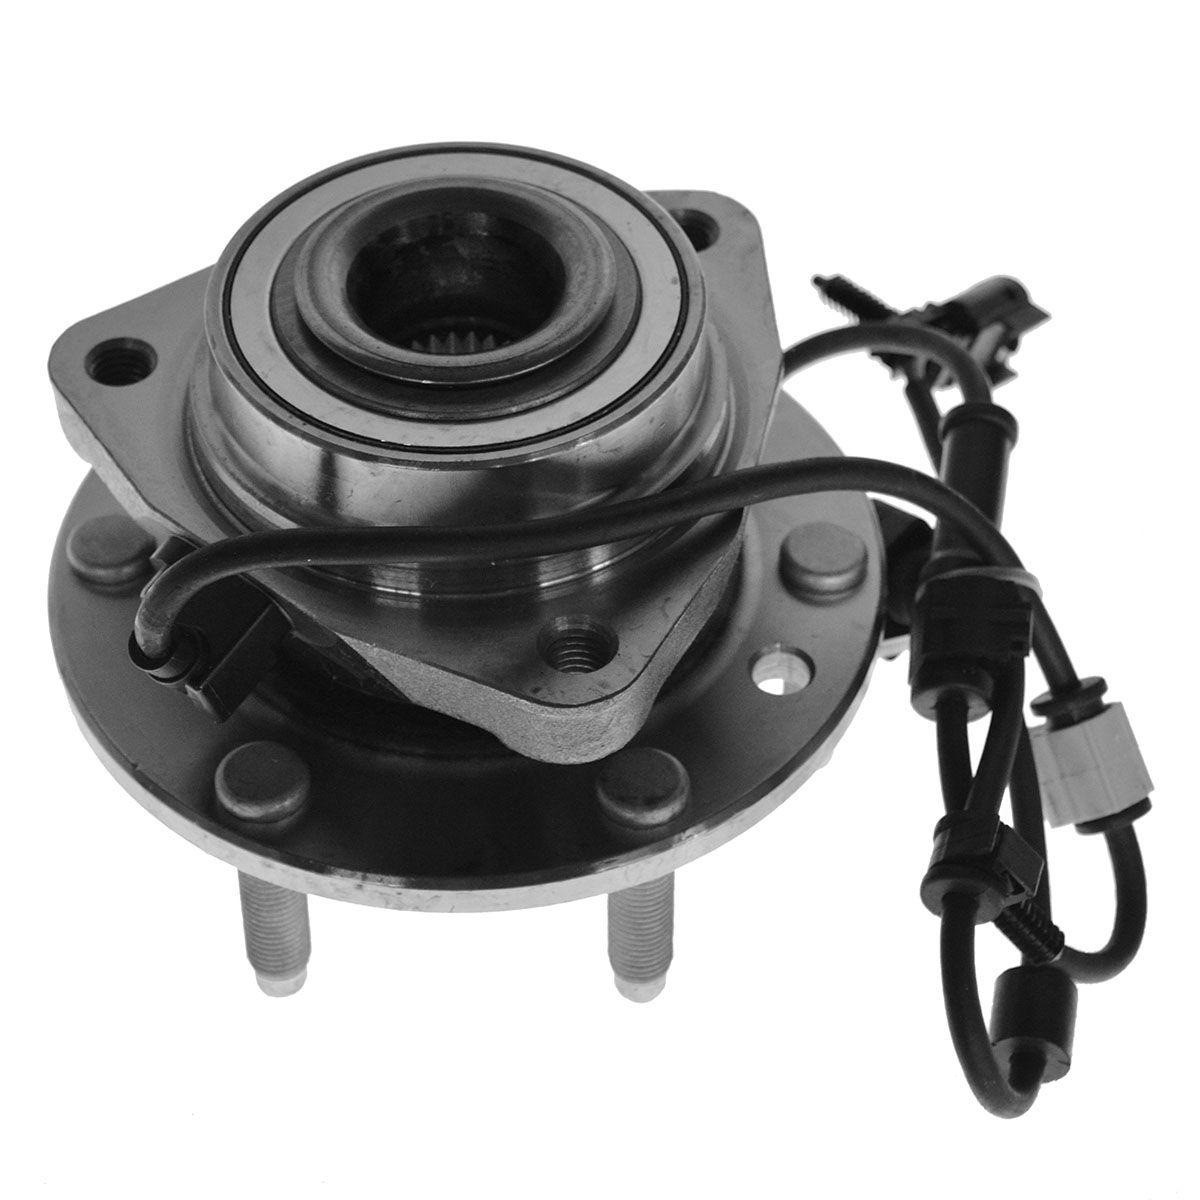 Chevy Trailblazer Envoy Bravada w ABS 6 Lug Front Wheel Hub Bearing Assembly